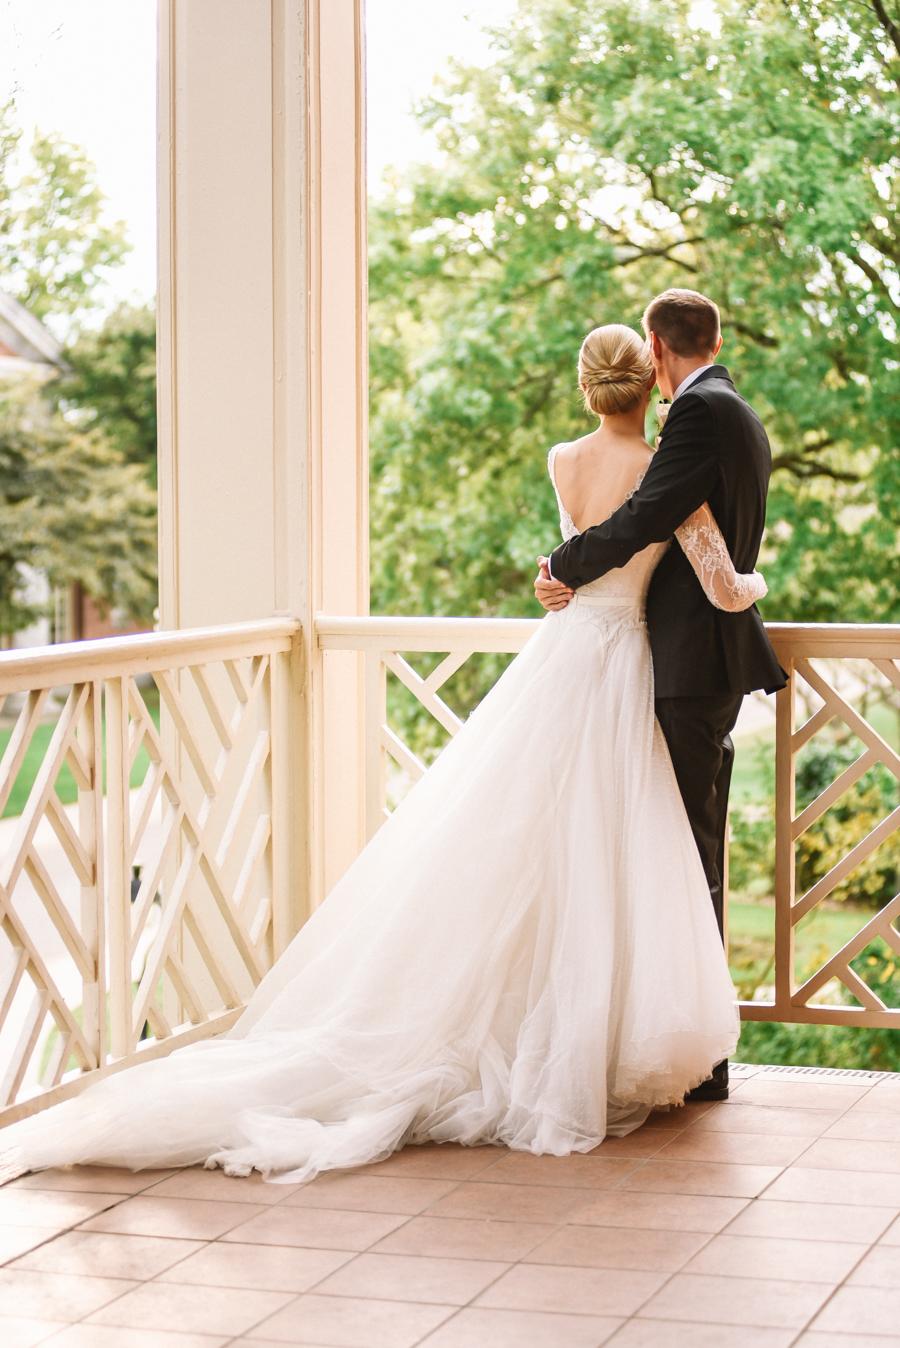 Henry_Ford__Lovett_Hall_Wedding_Detroit-40.jpg